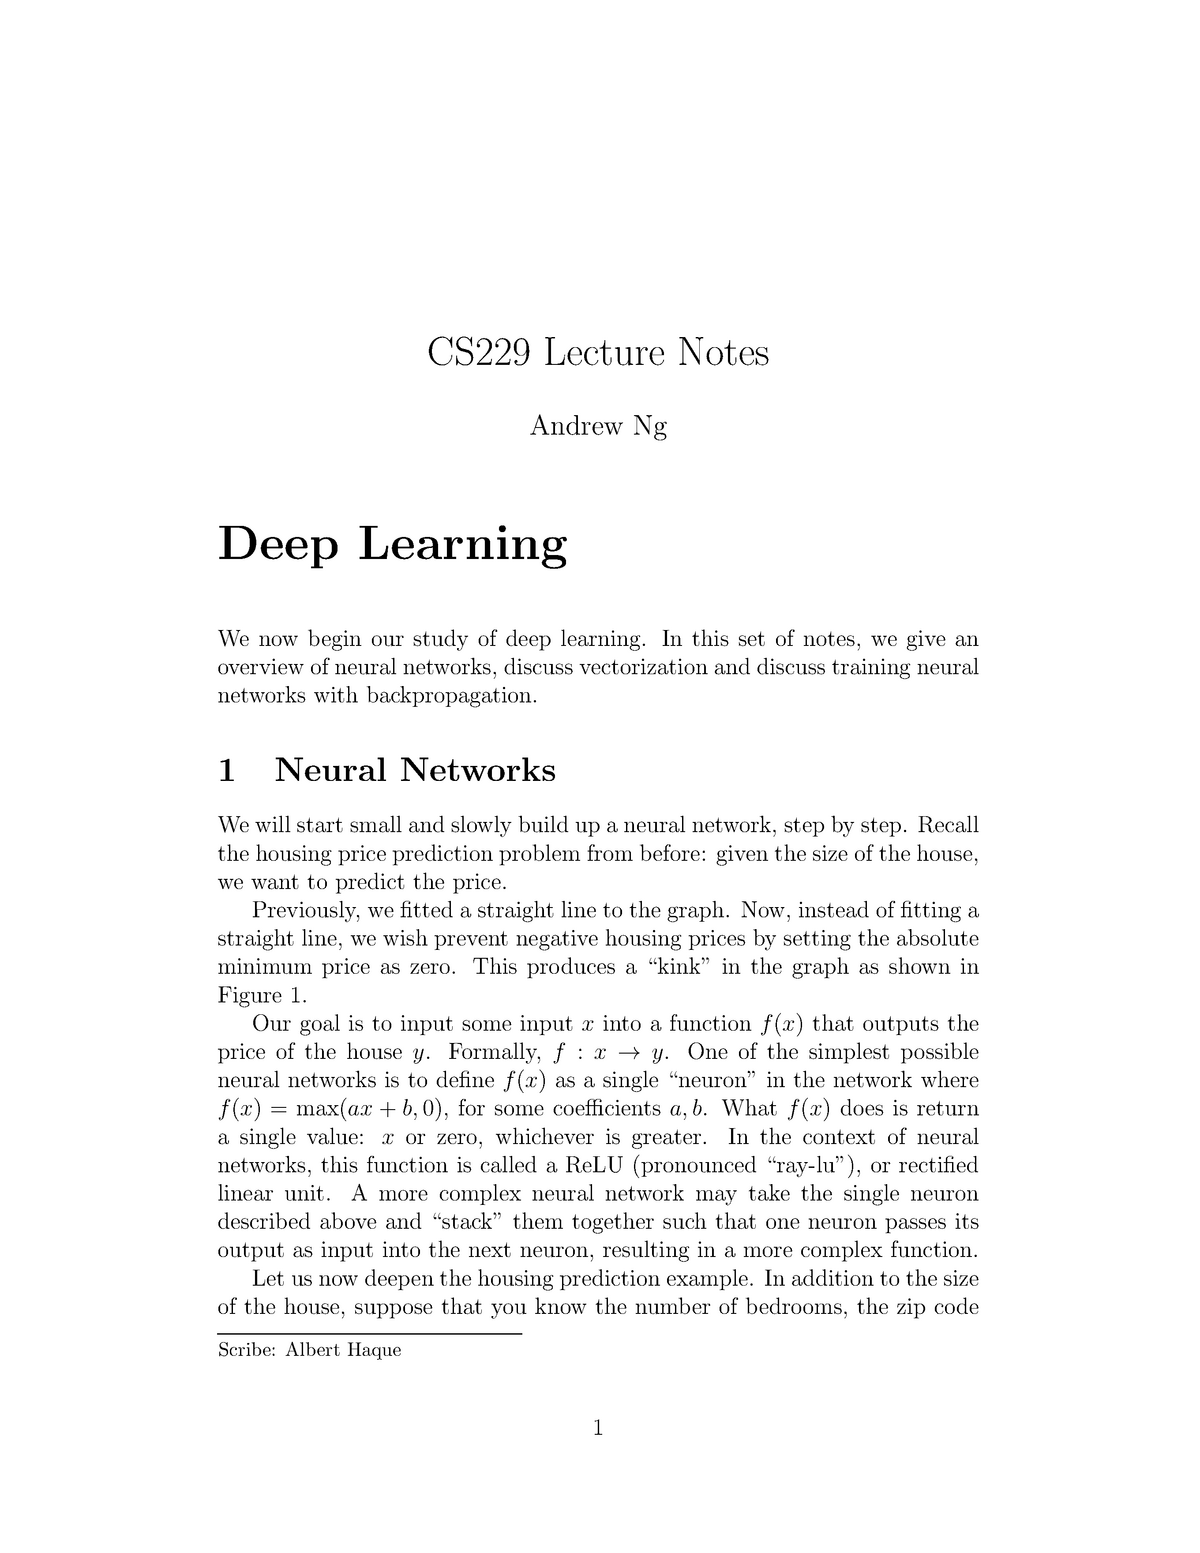 Cs229-notes-deep learning - CS 229: Machine Learning - StuDocu